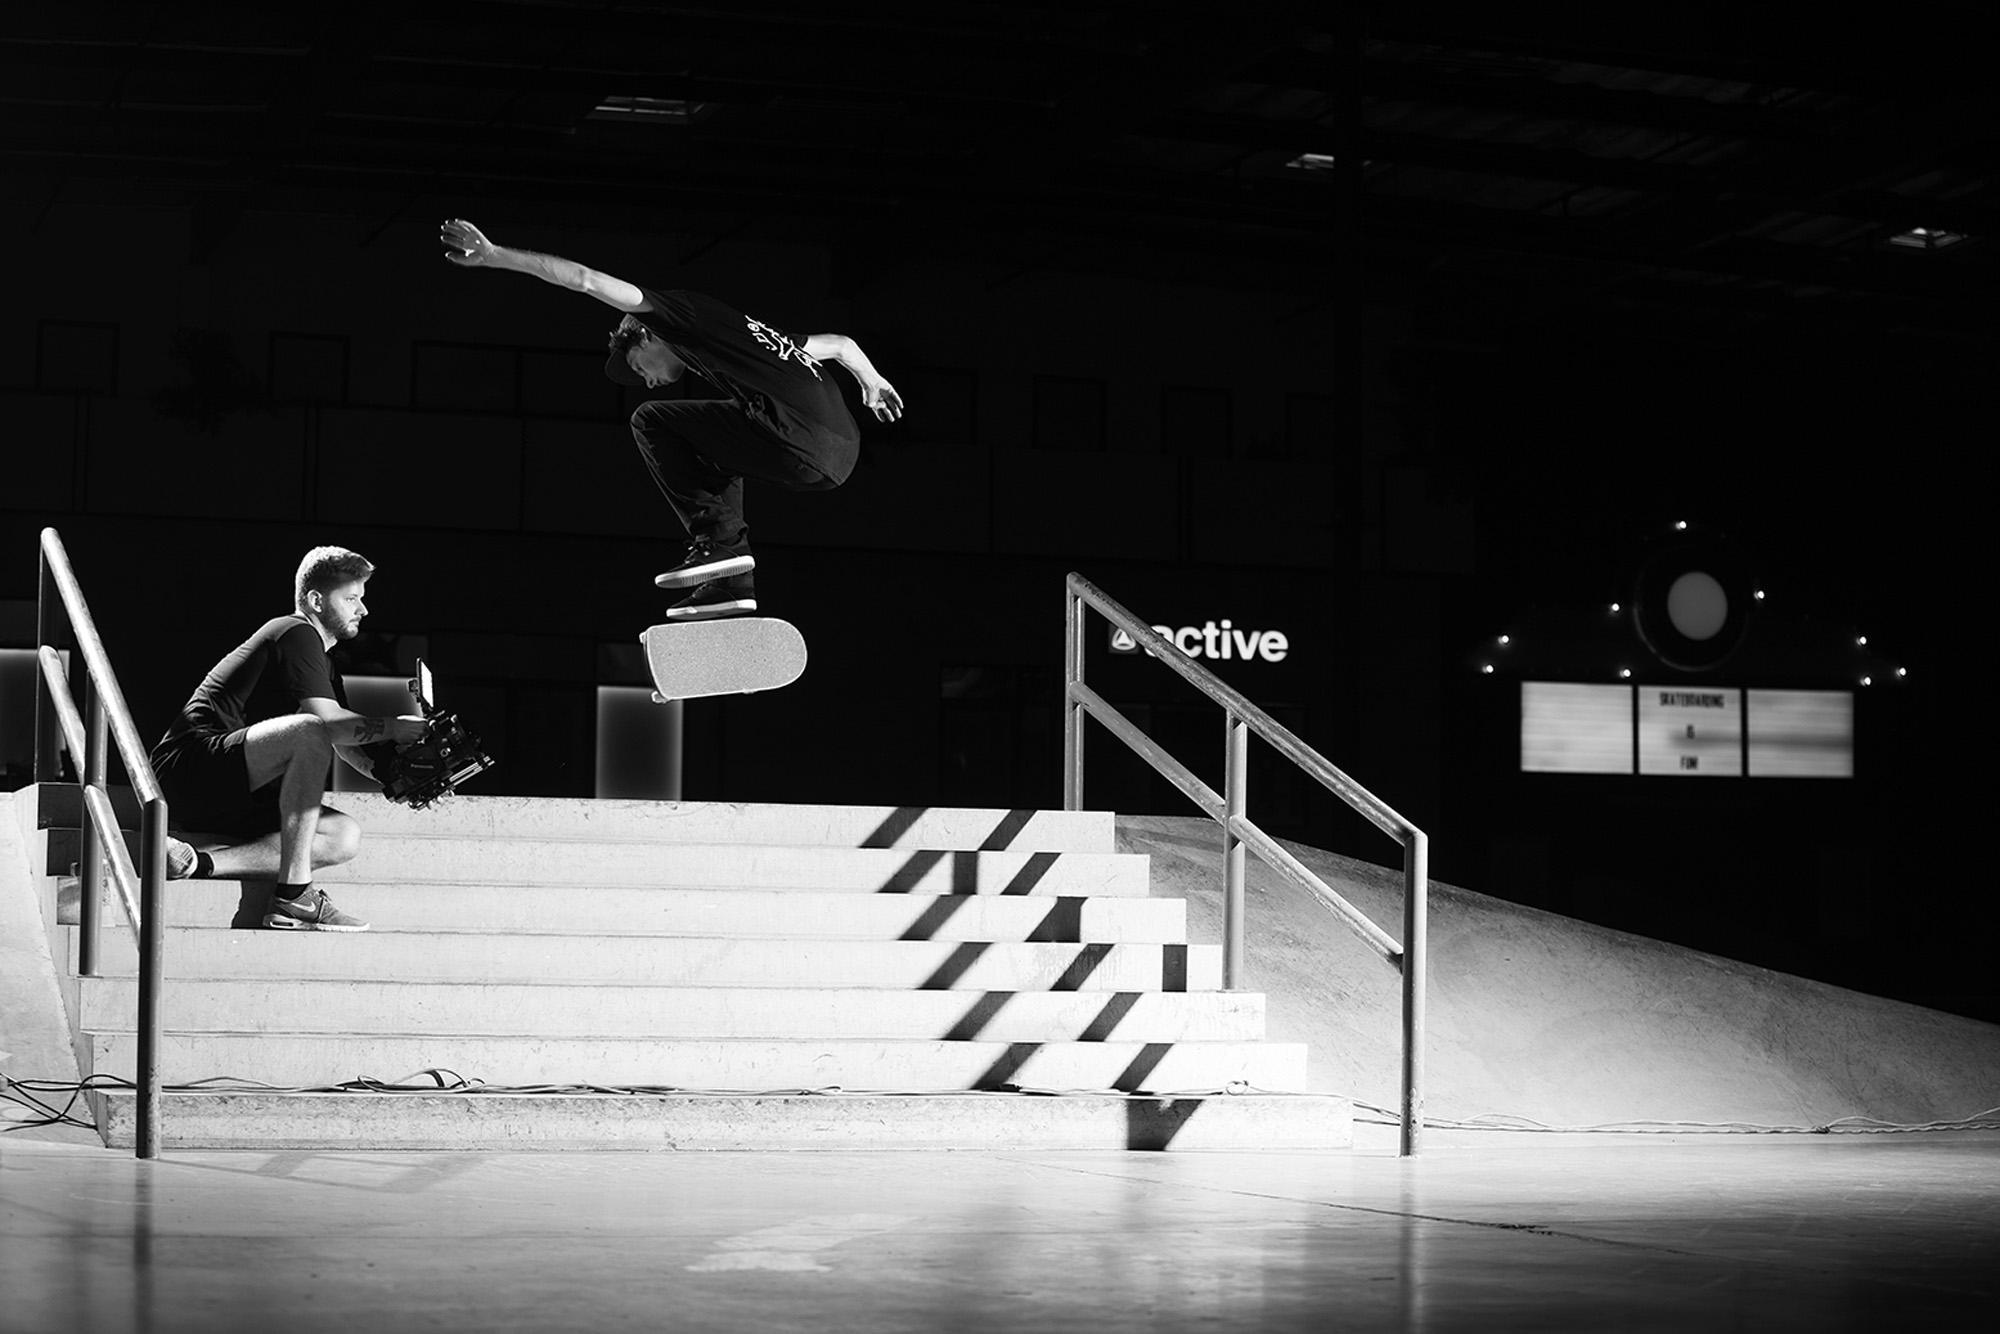 Tyson Bowerbank Almost Skateboards - The Berrics Recruit 7